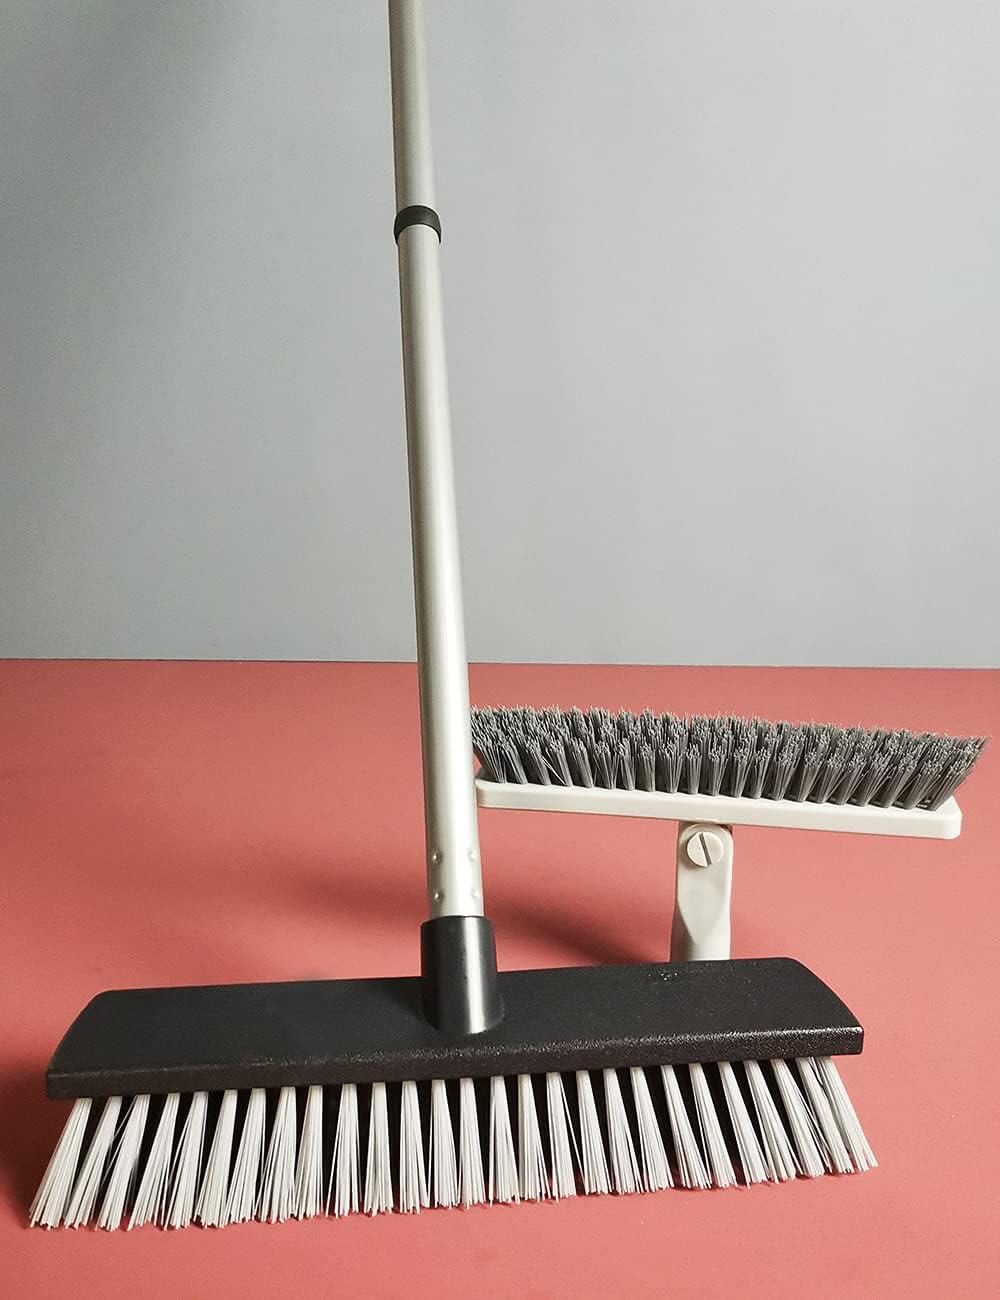 Deck Push Broom Heavy Duty Outdoor Commercial Max 81% OFF Stiff Indoor Brush Max 59% OFF